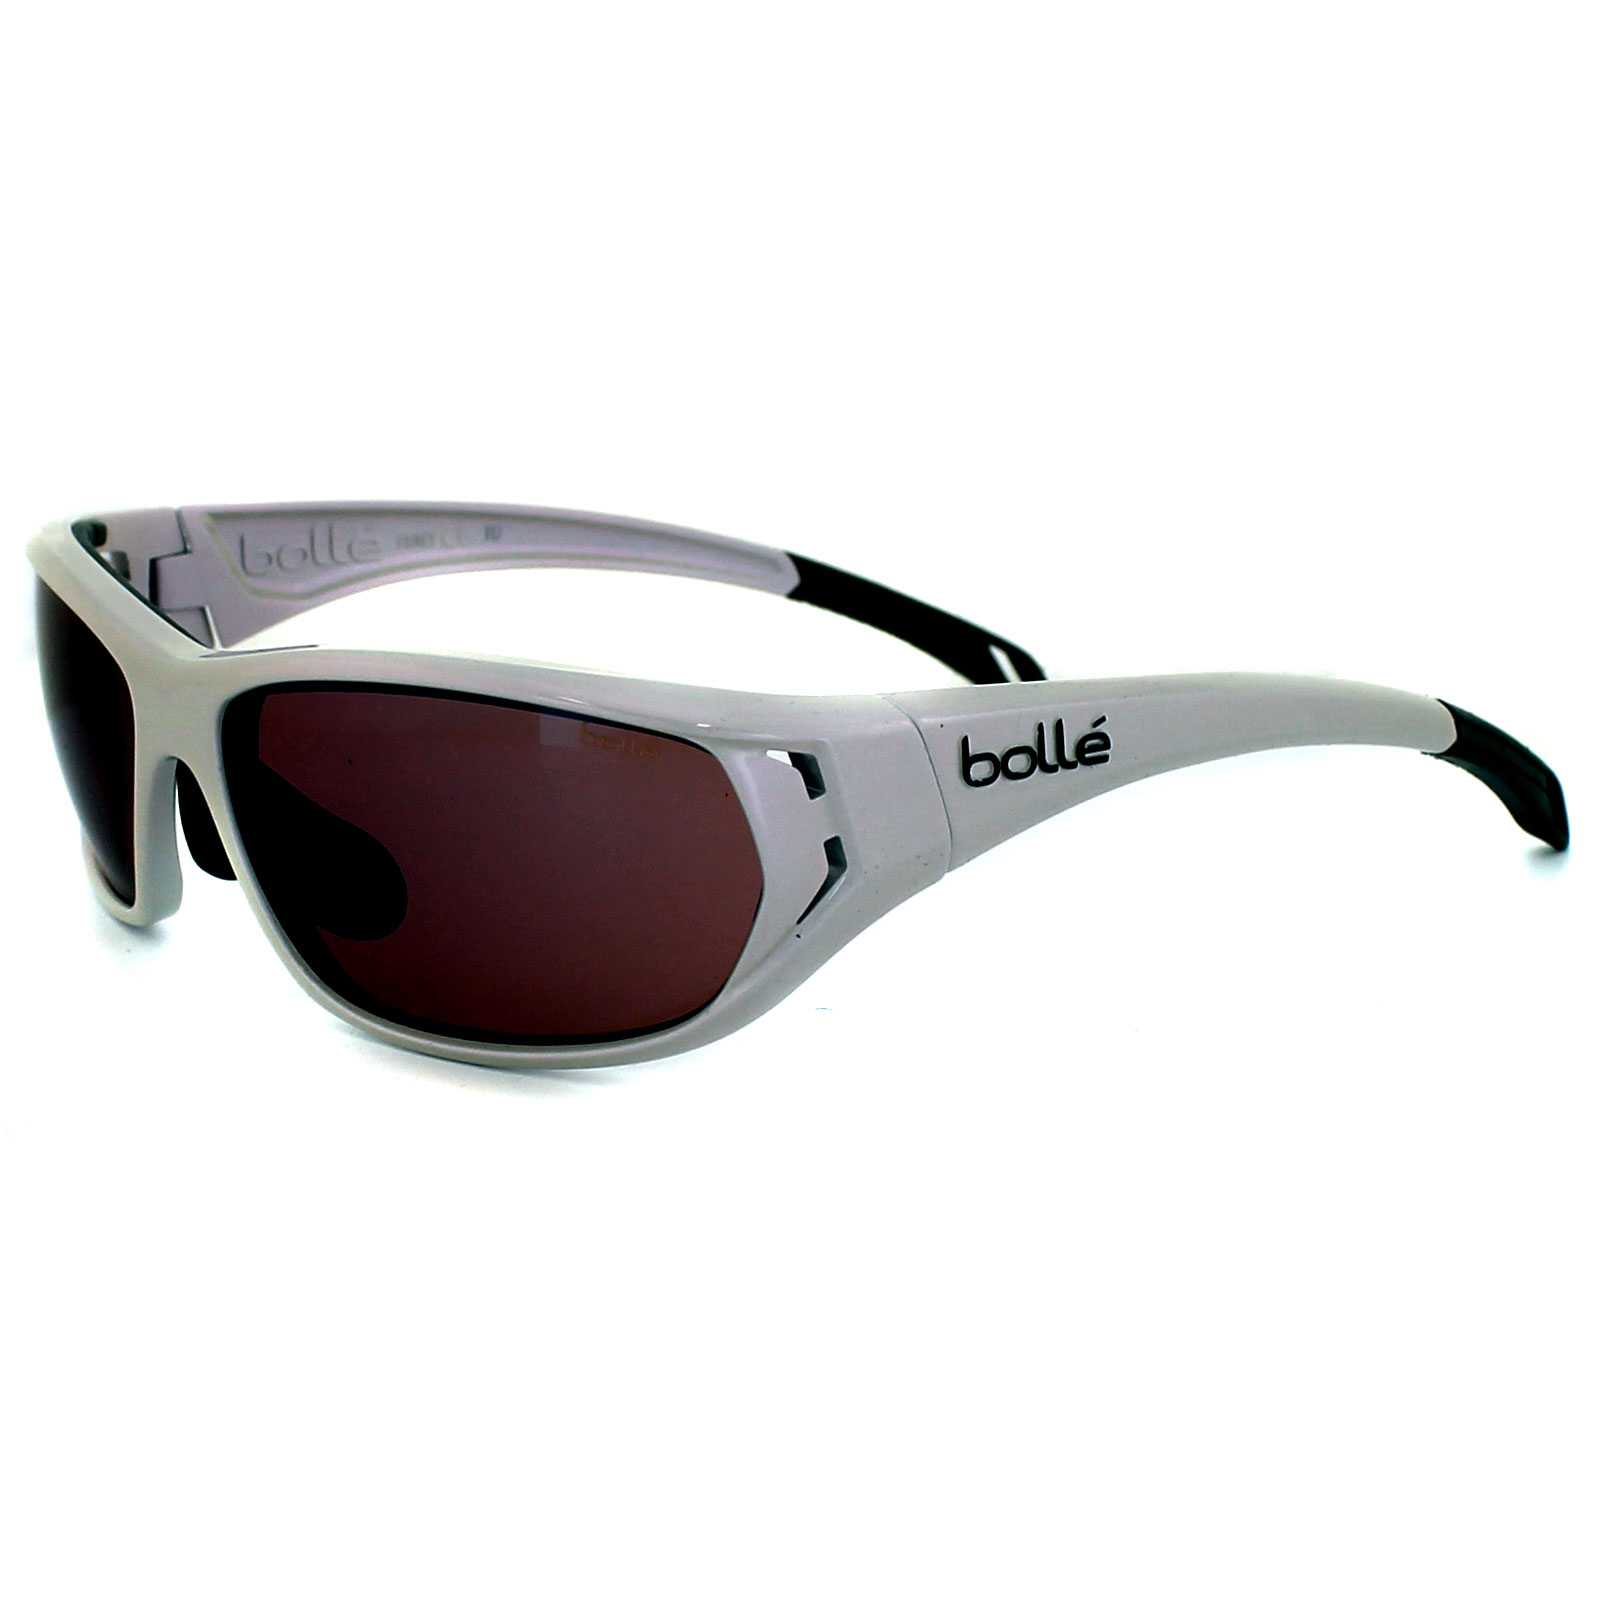 20779340721 Discount Bolle Sunglasses